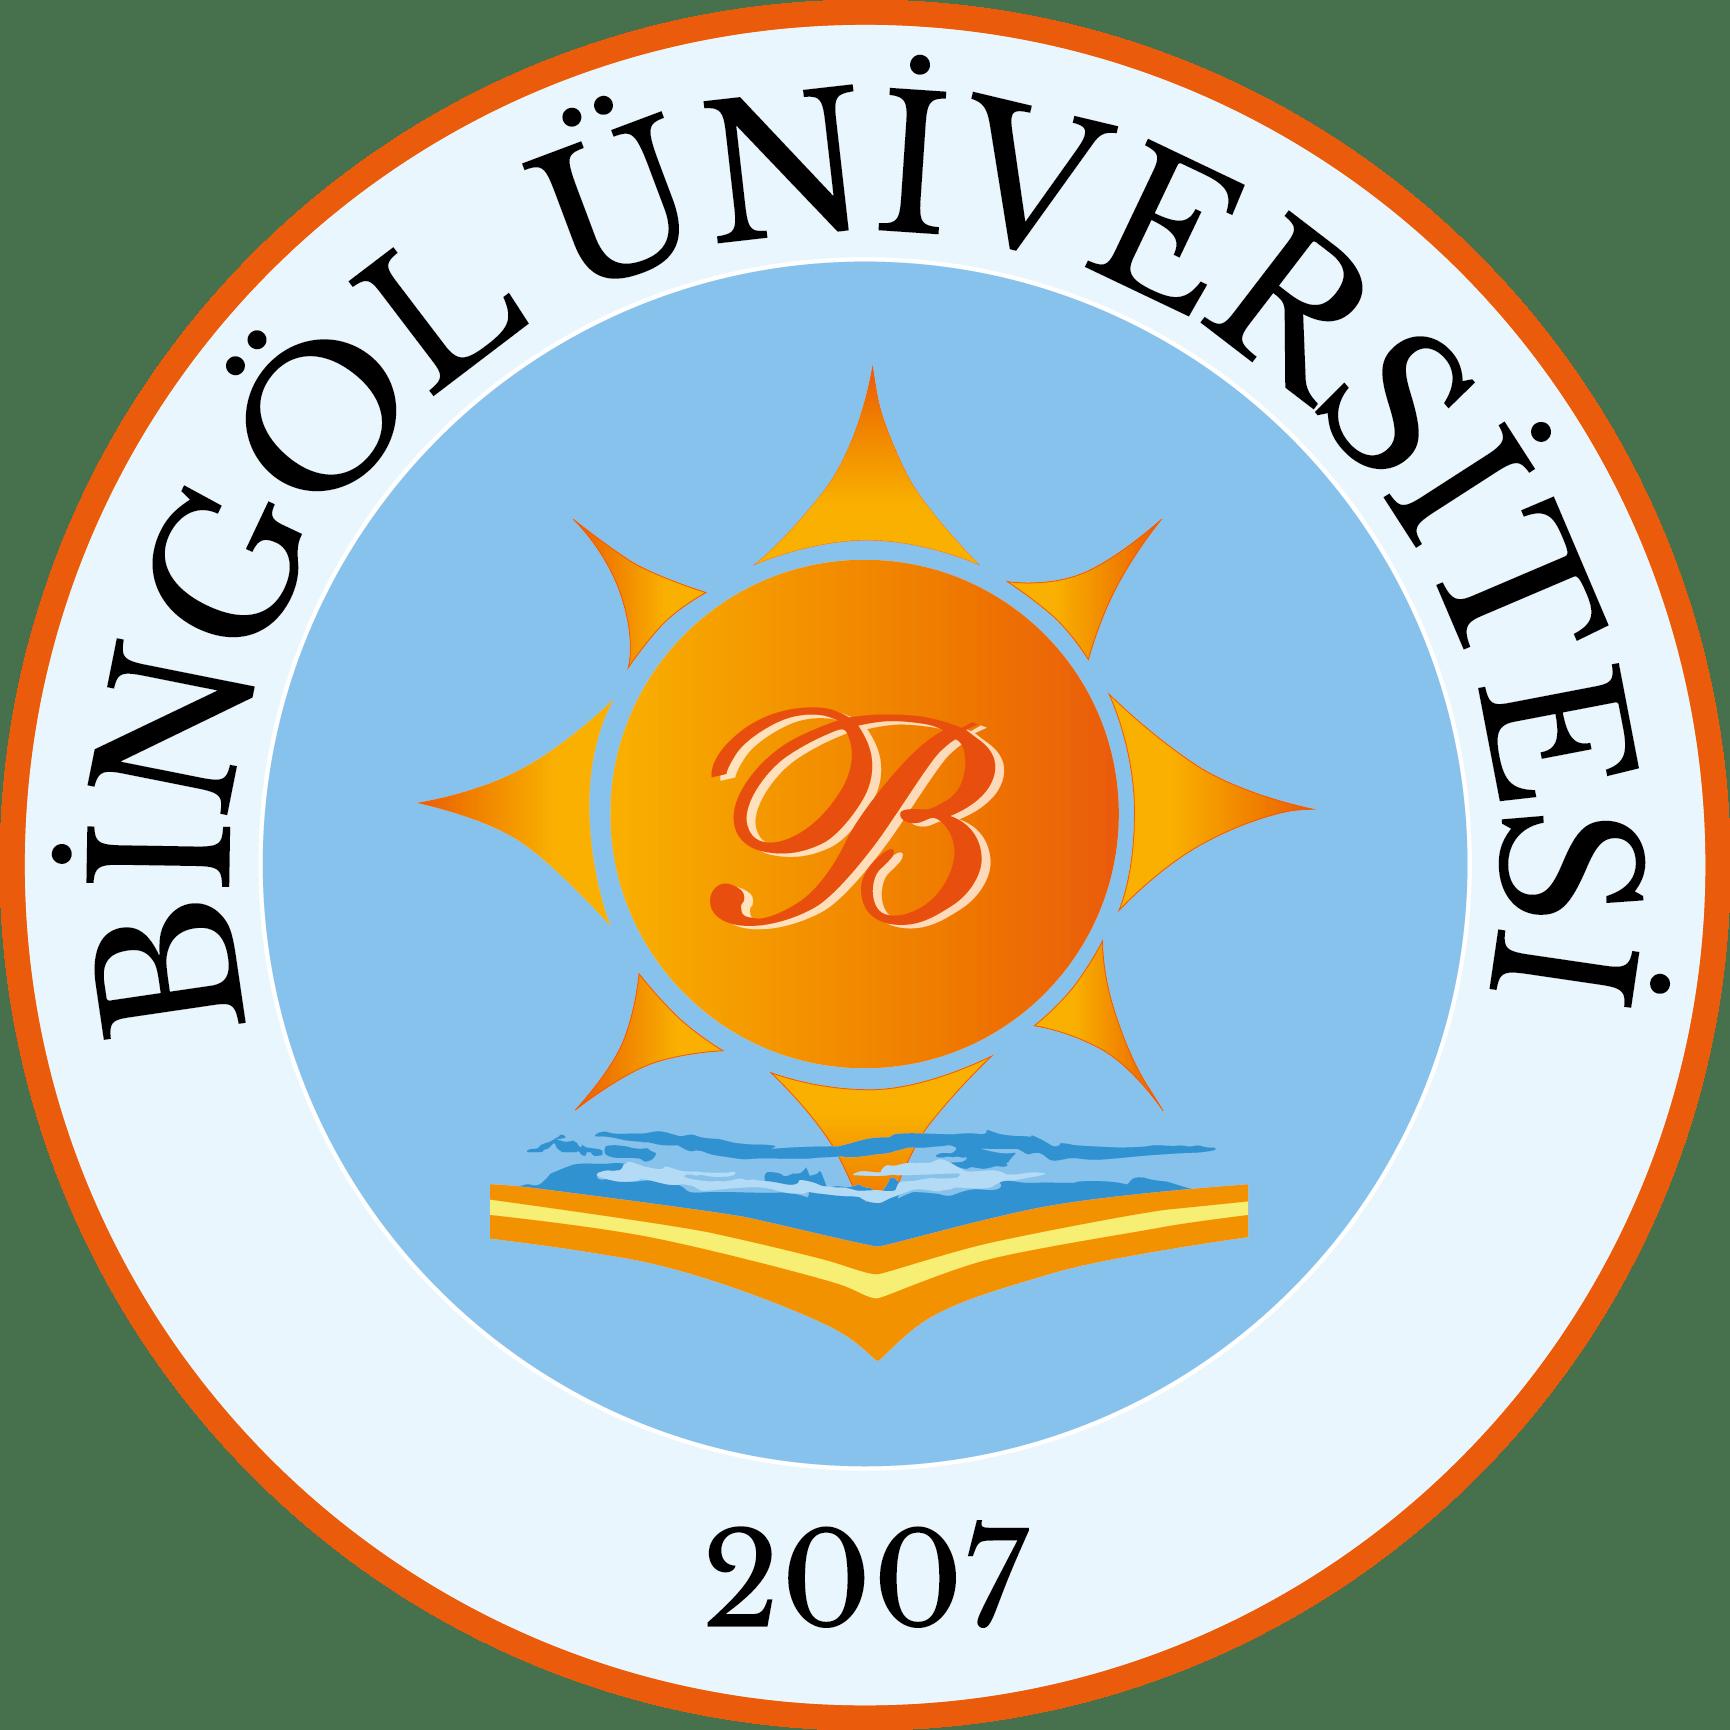 Bingöl Üniversitesi Logo   Arma png